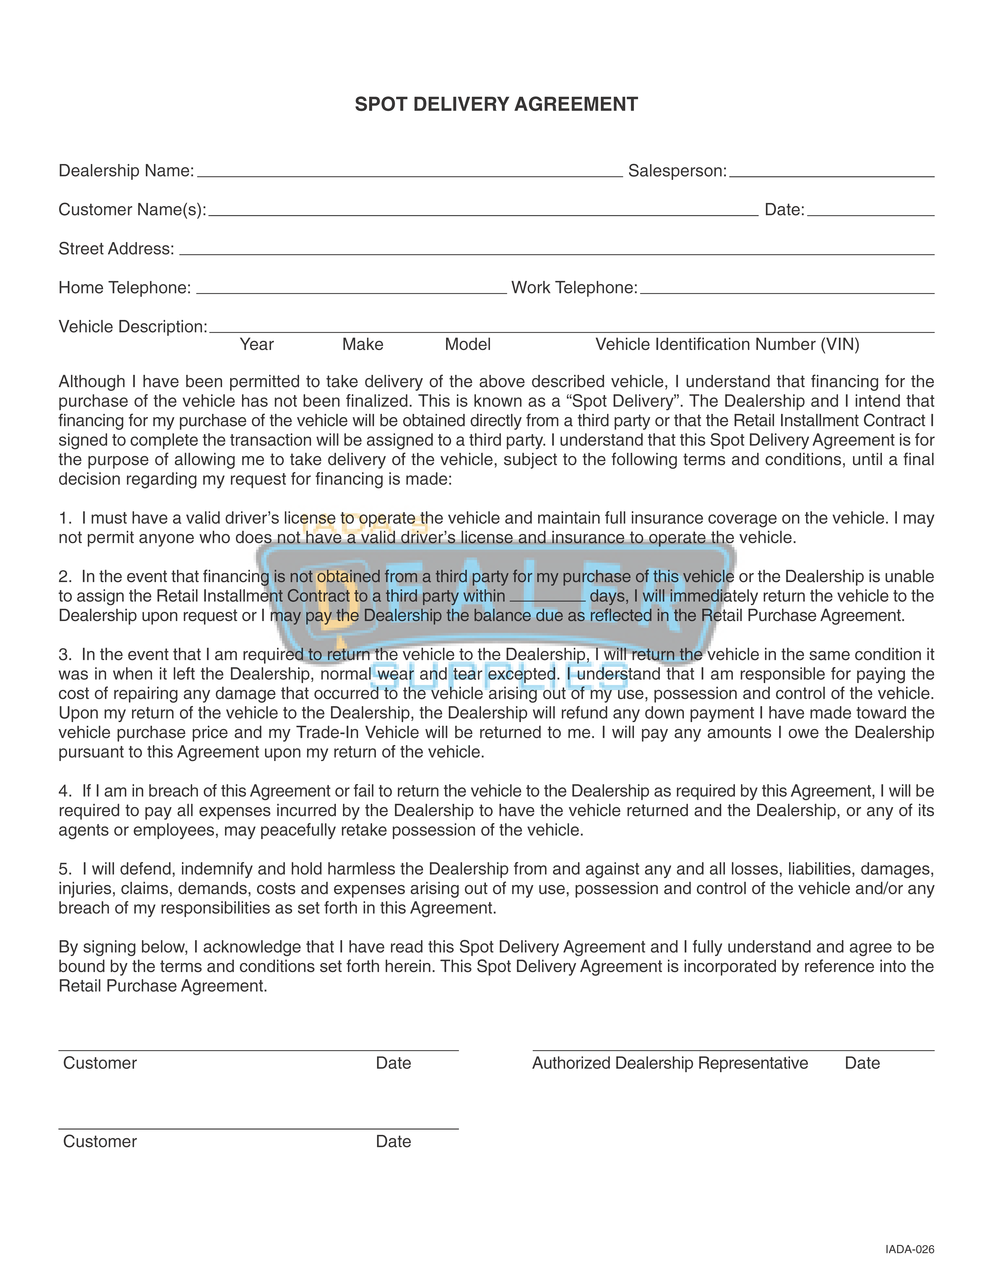 Car Dealership Goodwill Agreement